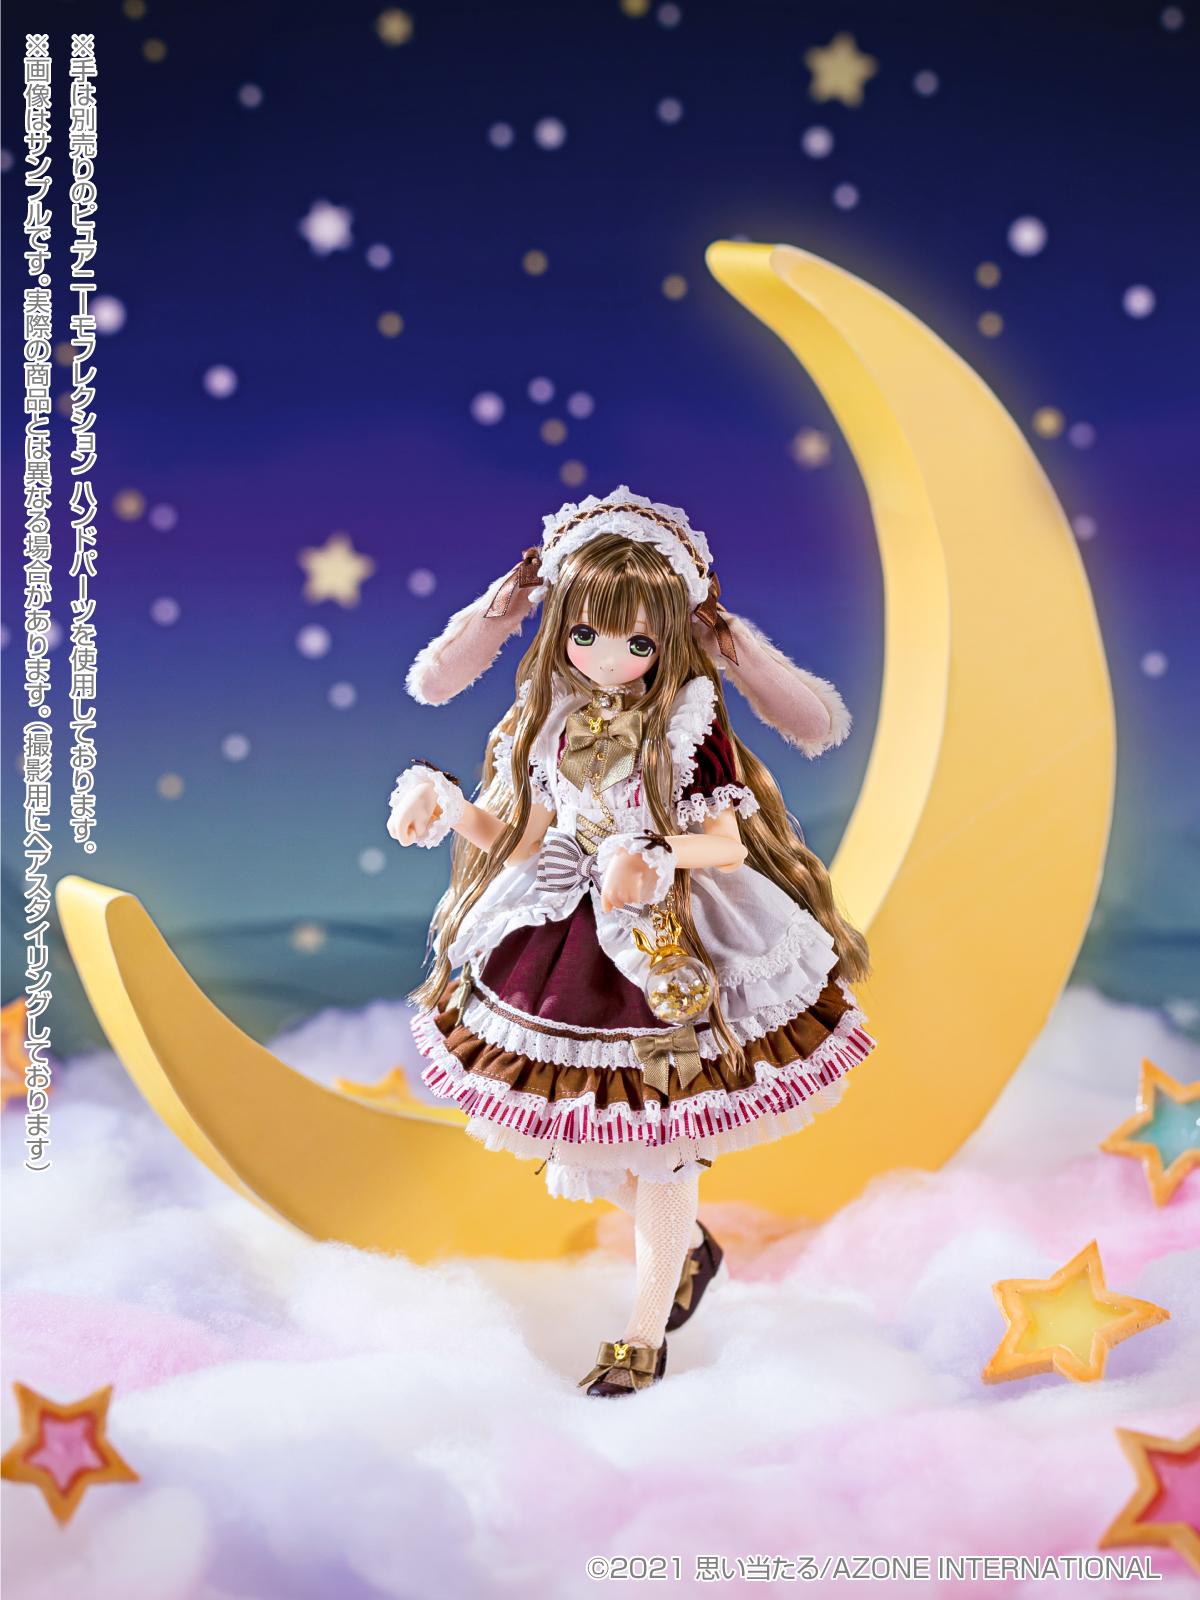 Star Sprinkles『Moon Rabbit Miu/ムーンラビット 月兎 みう』えっくす☆きゅーと 1/6 完成品ドール-011